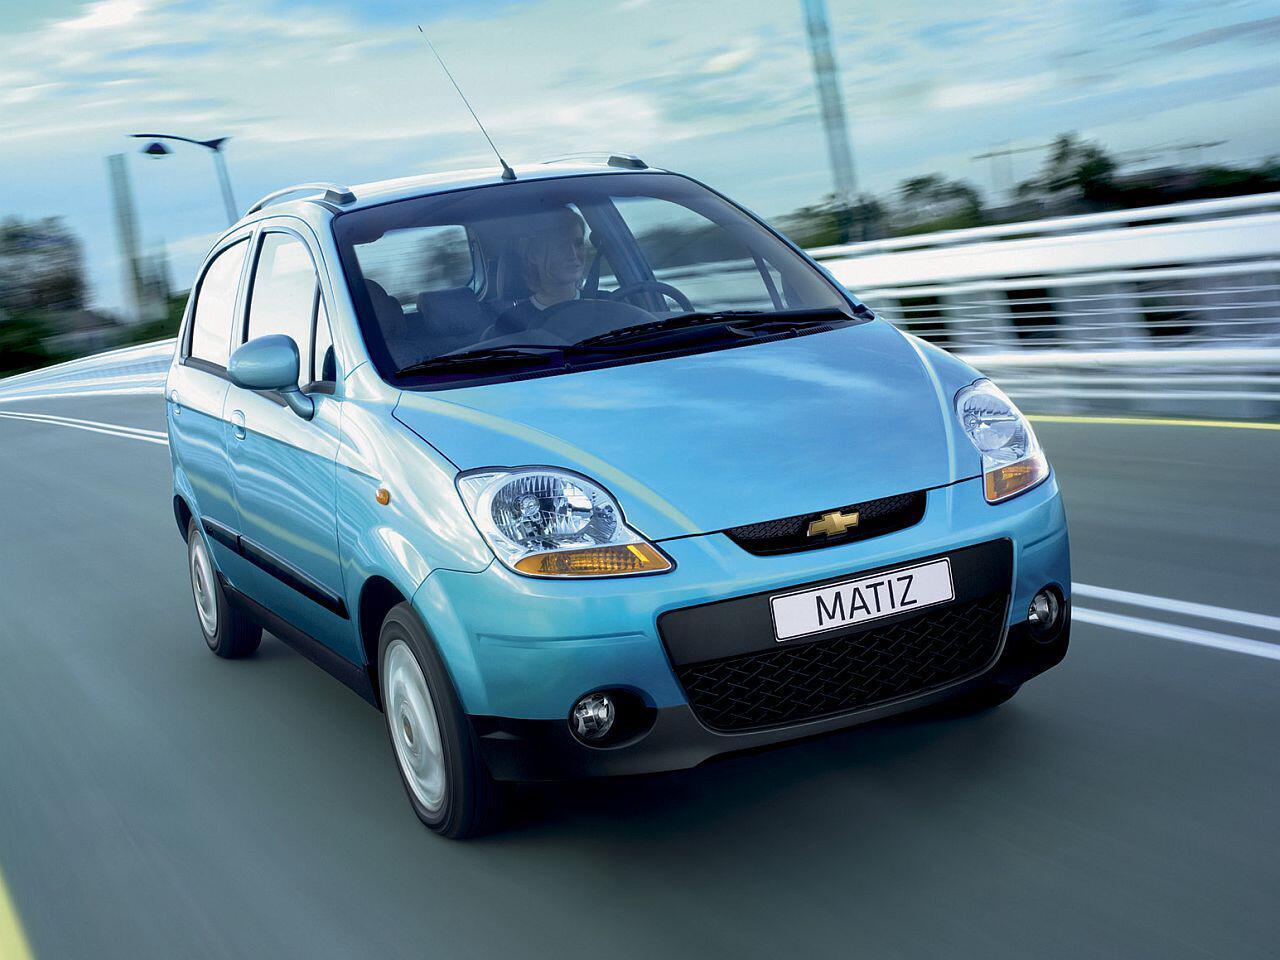 Bild zu Platz 3: Chevrolet Matiz